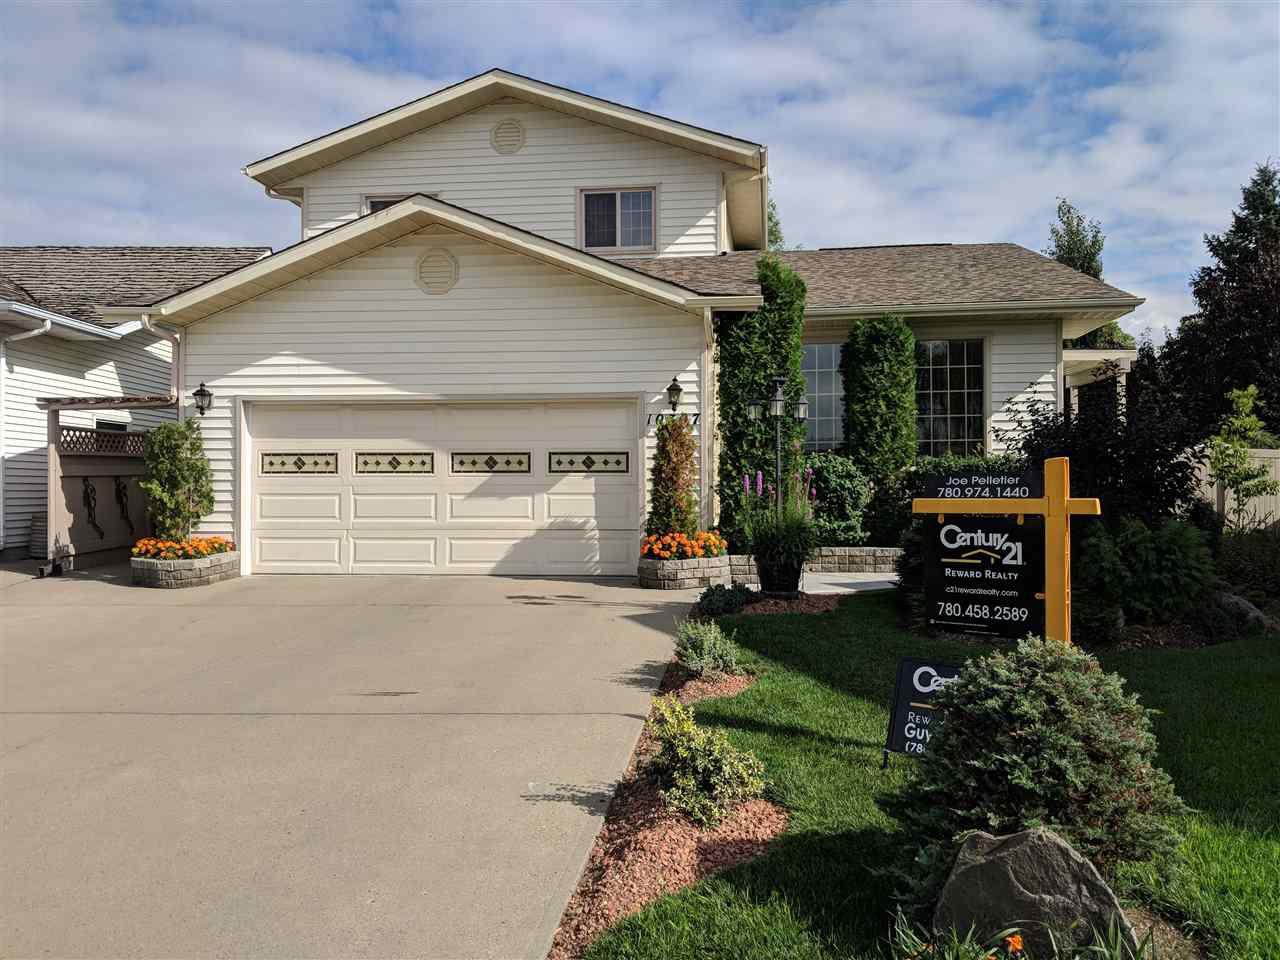 Main Photo: 10307 154 Avenue in Edmonton: Zone 27 House for sale : MLS®# E4125831